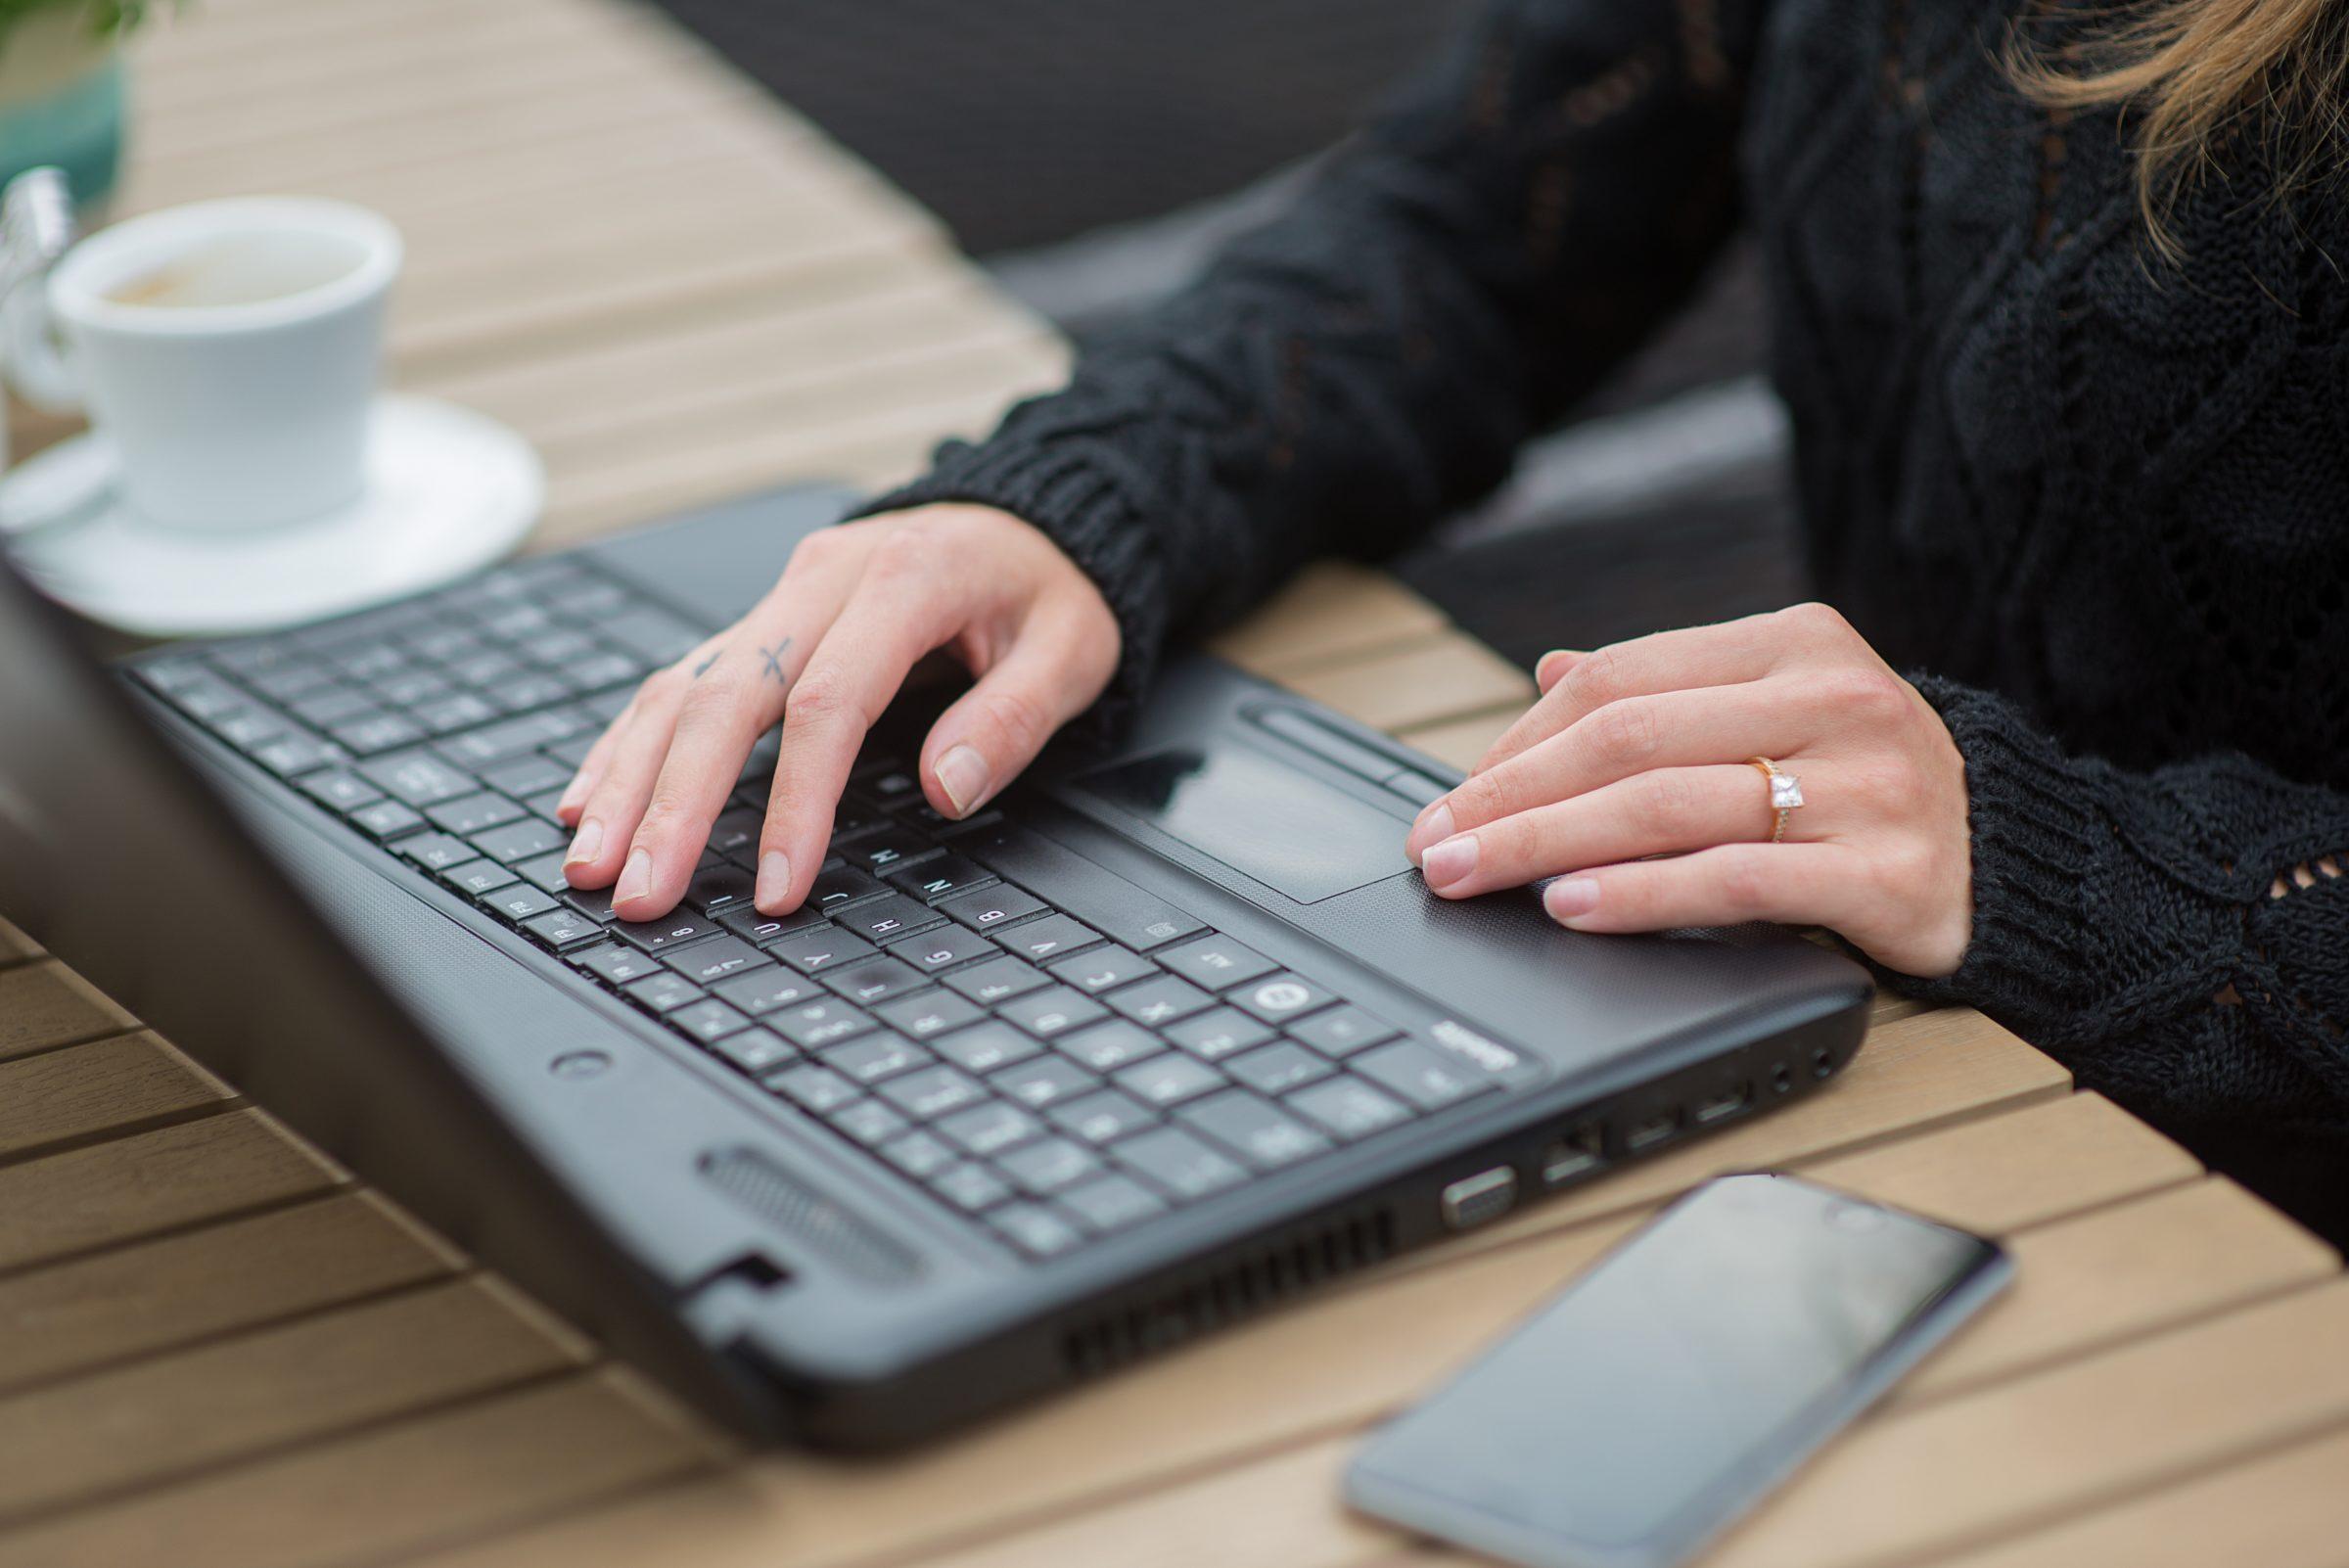 computer keyboard 6TJEXZL